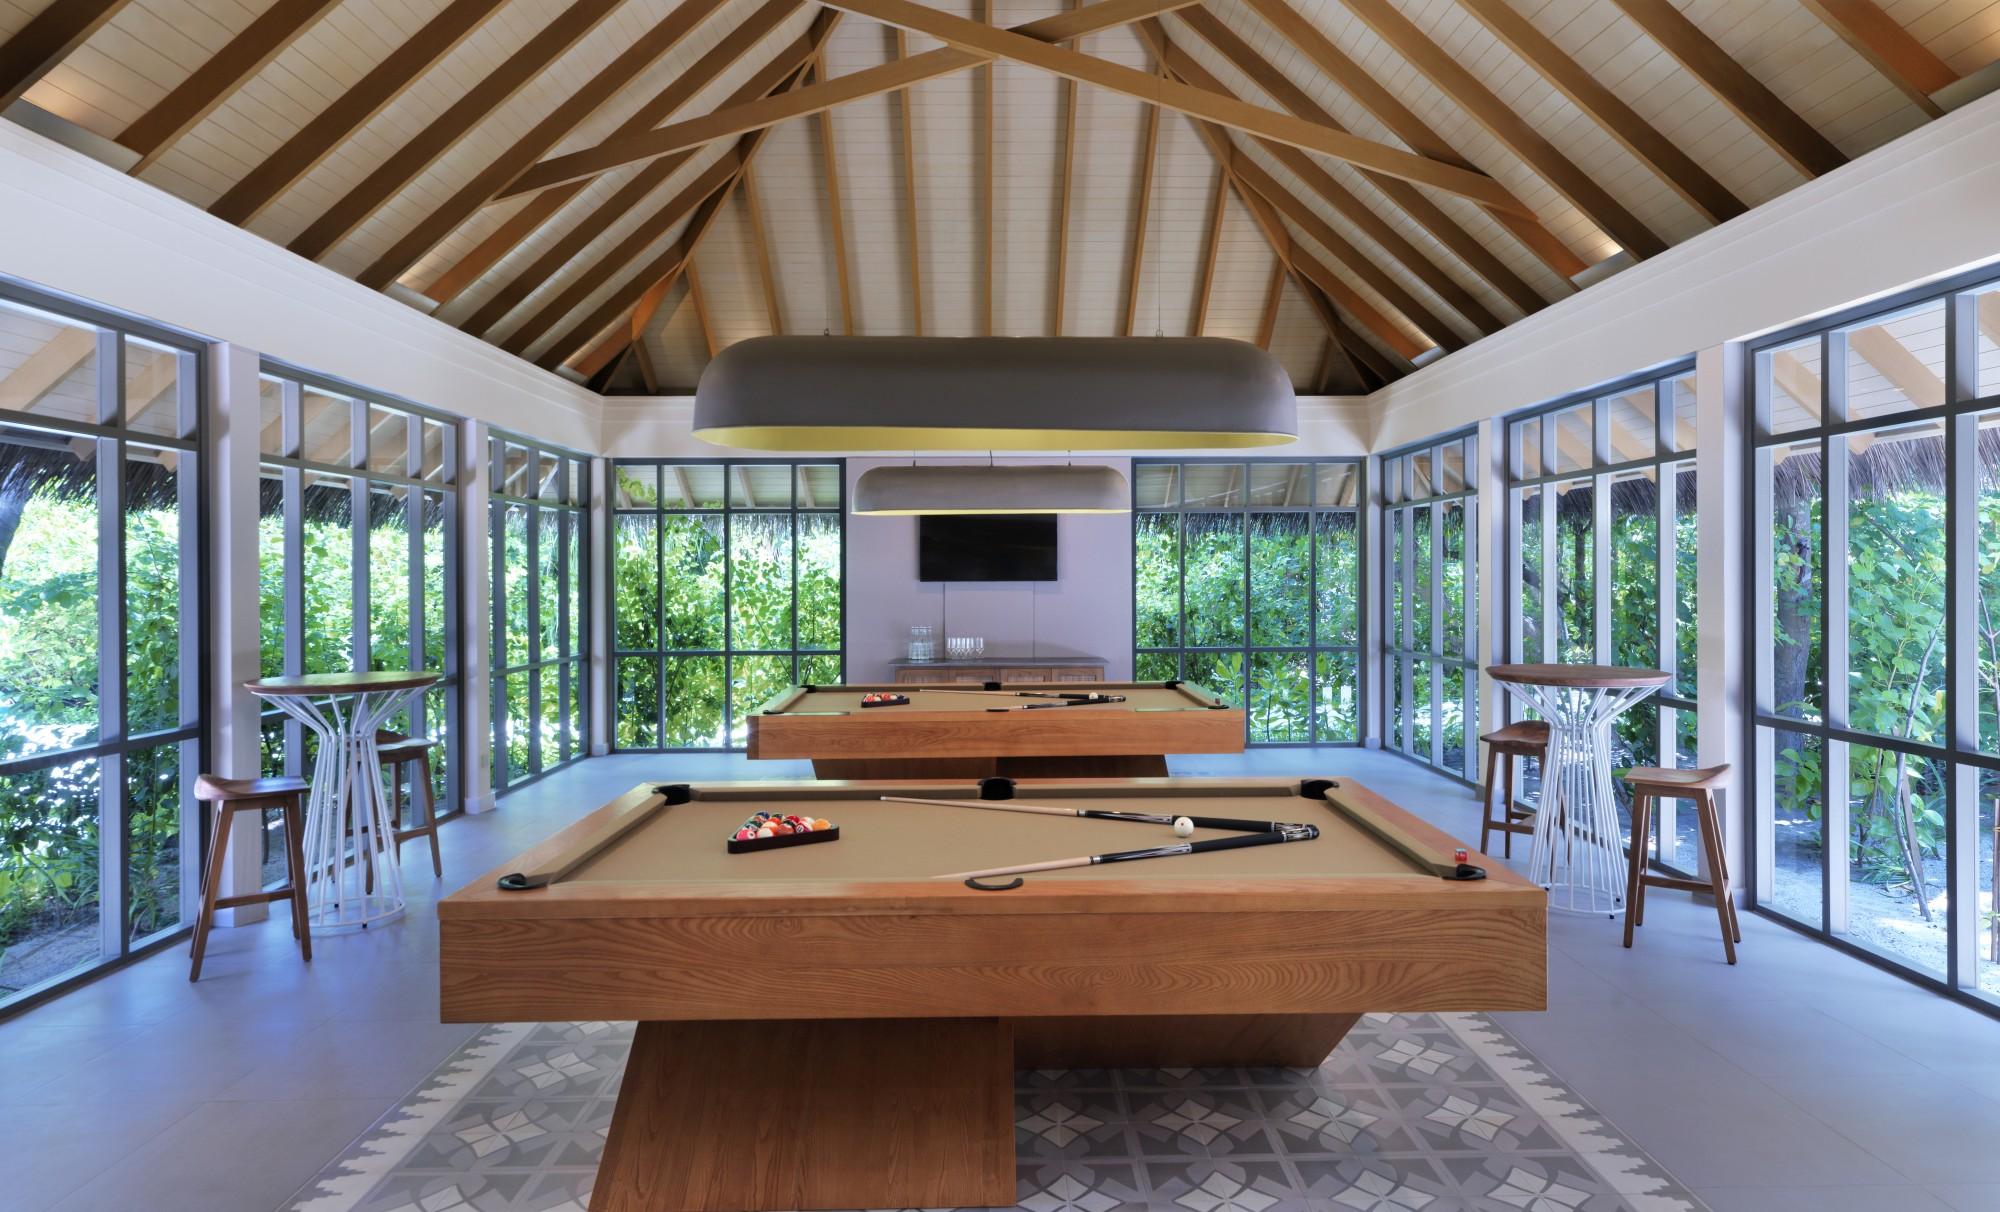 https://www.otdesign.com/wp-content/uploads/2020/11/OTdesign_Vakkaru_coconut-club-pool-tables.jpg